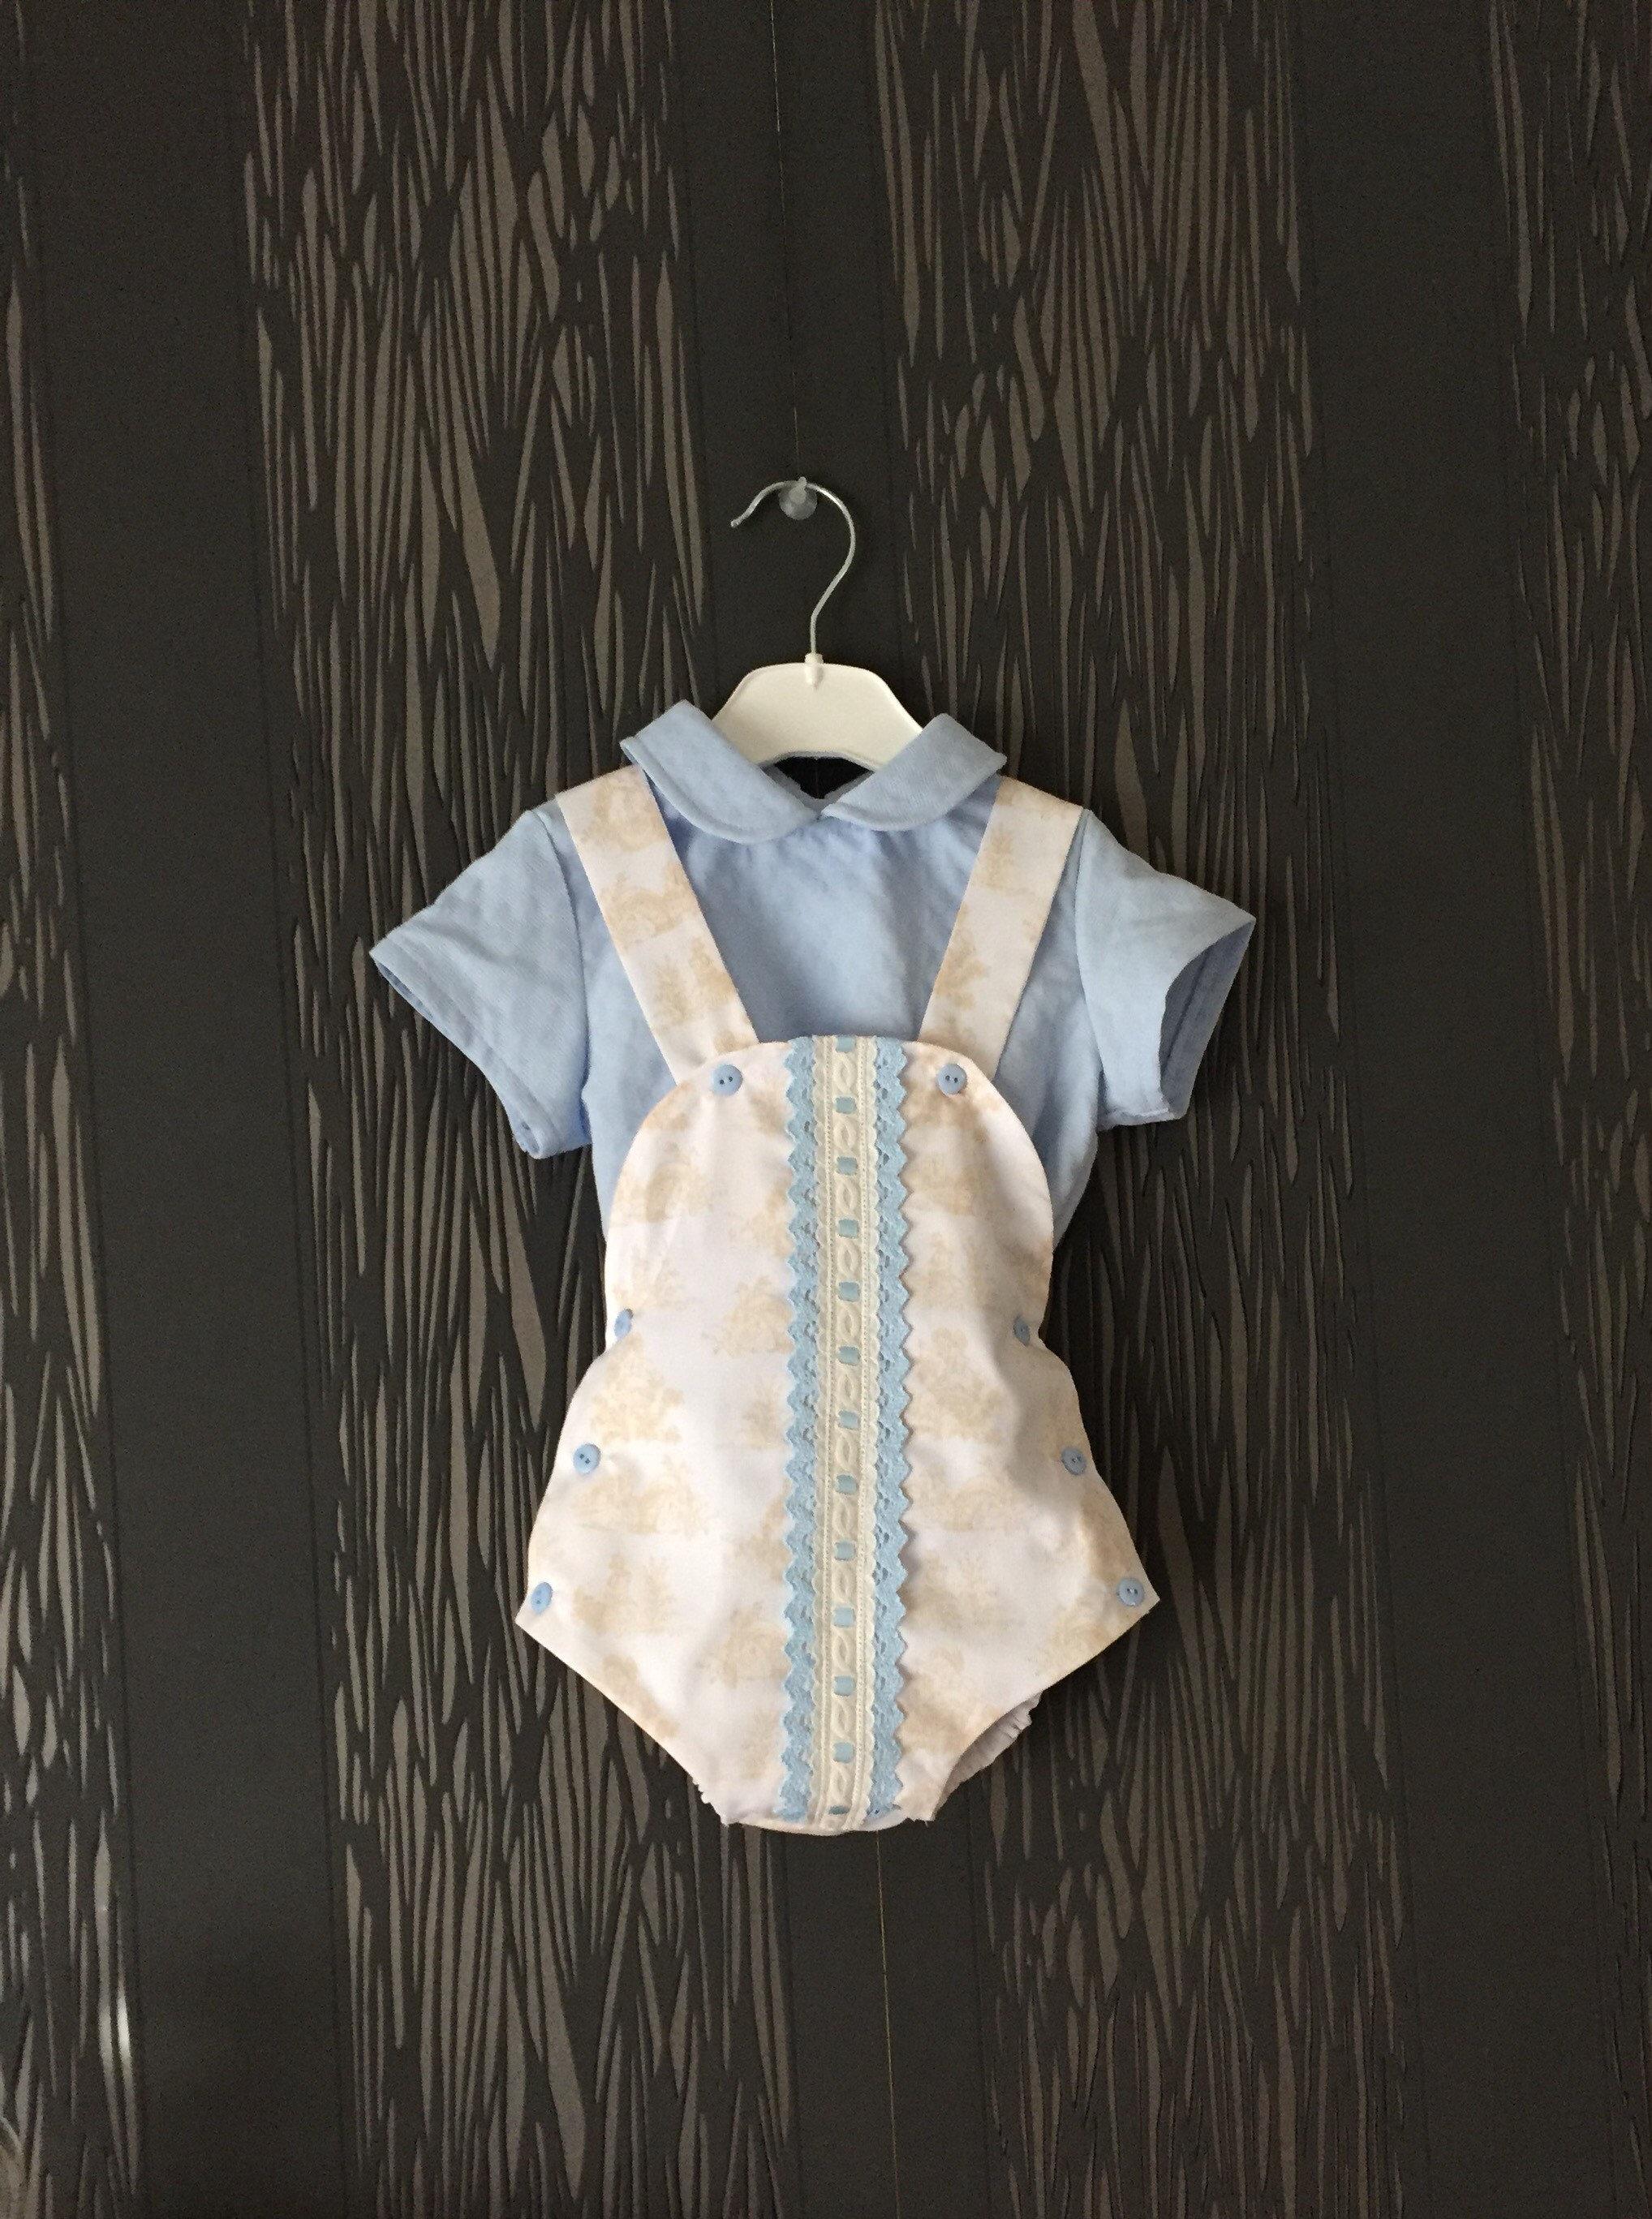 838e5cd7e335 Baby boy romper with blue shirt toddler boy summer romper